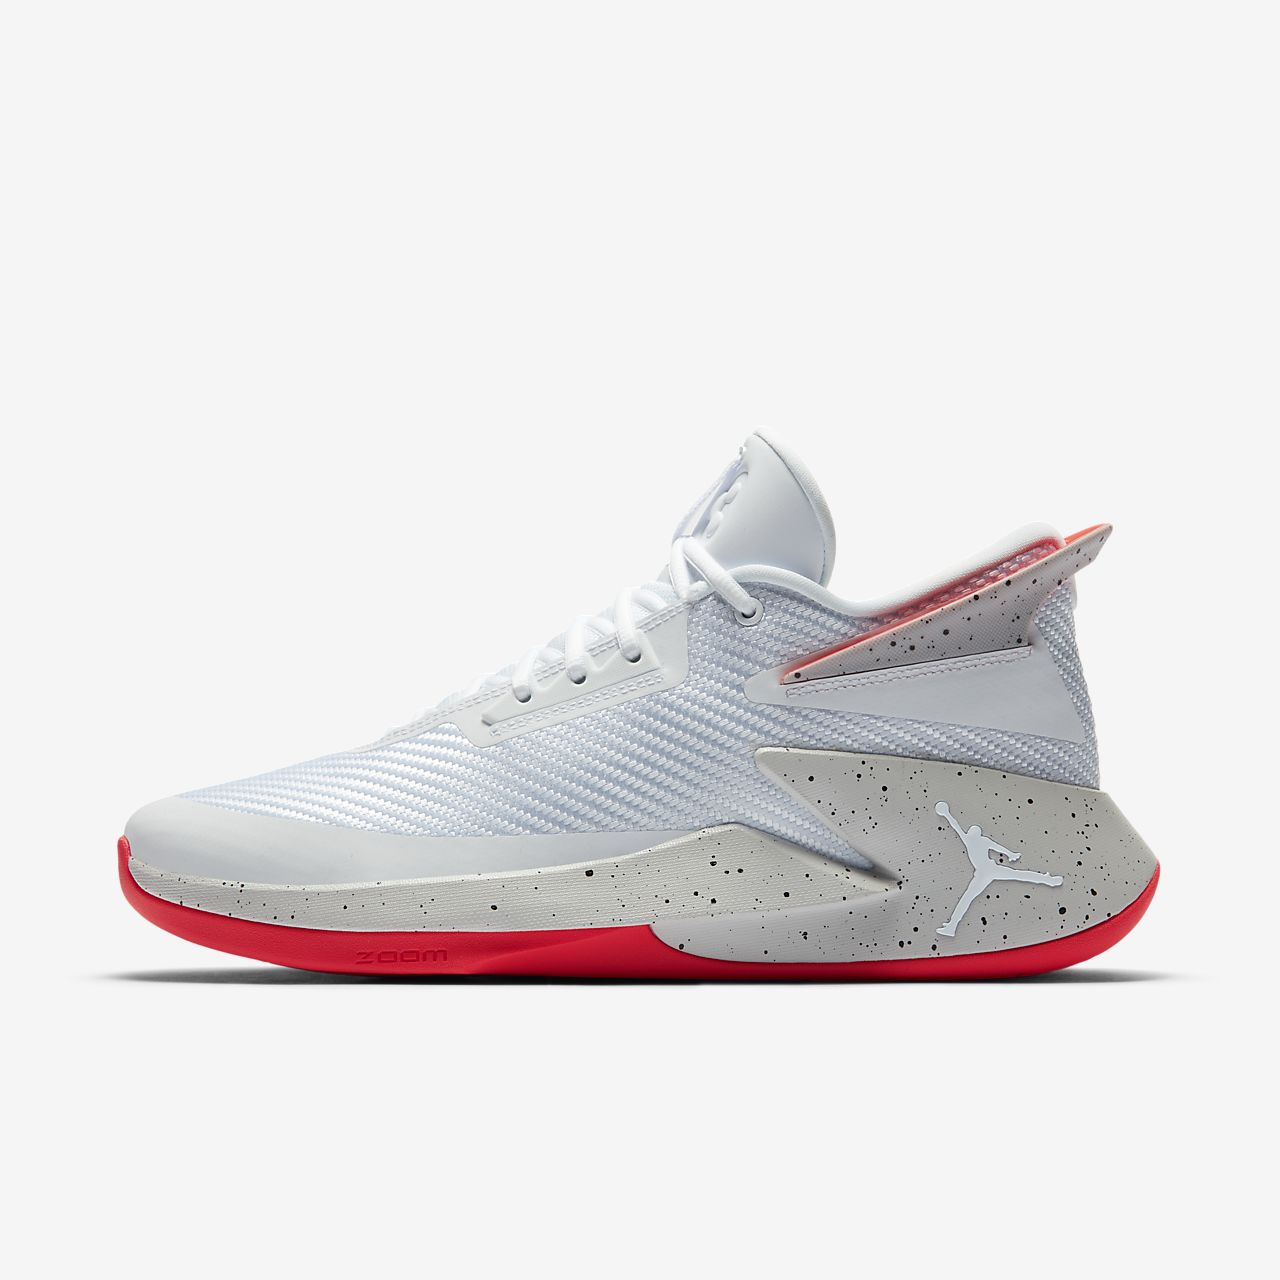 Chaussure de basketball Jordan Fly Lockdown pour Homme